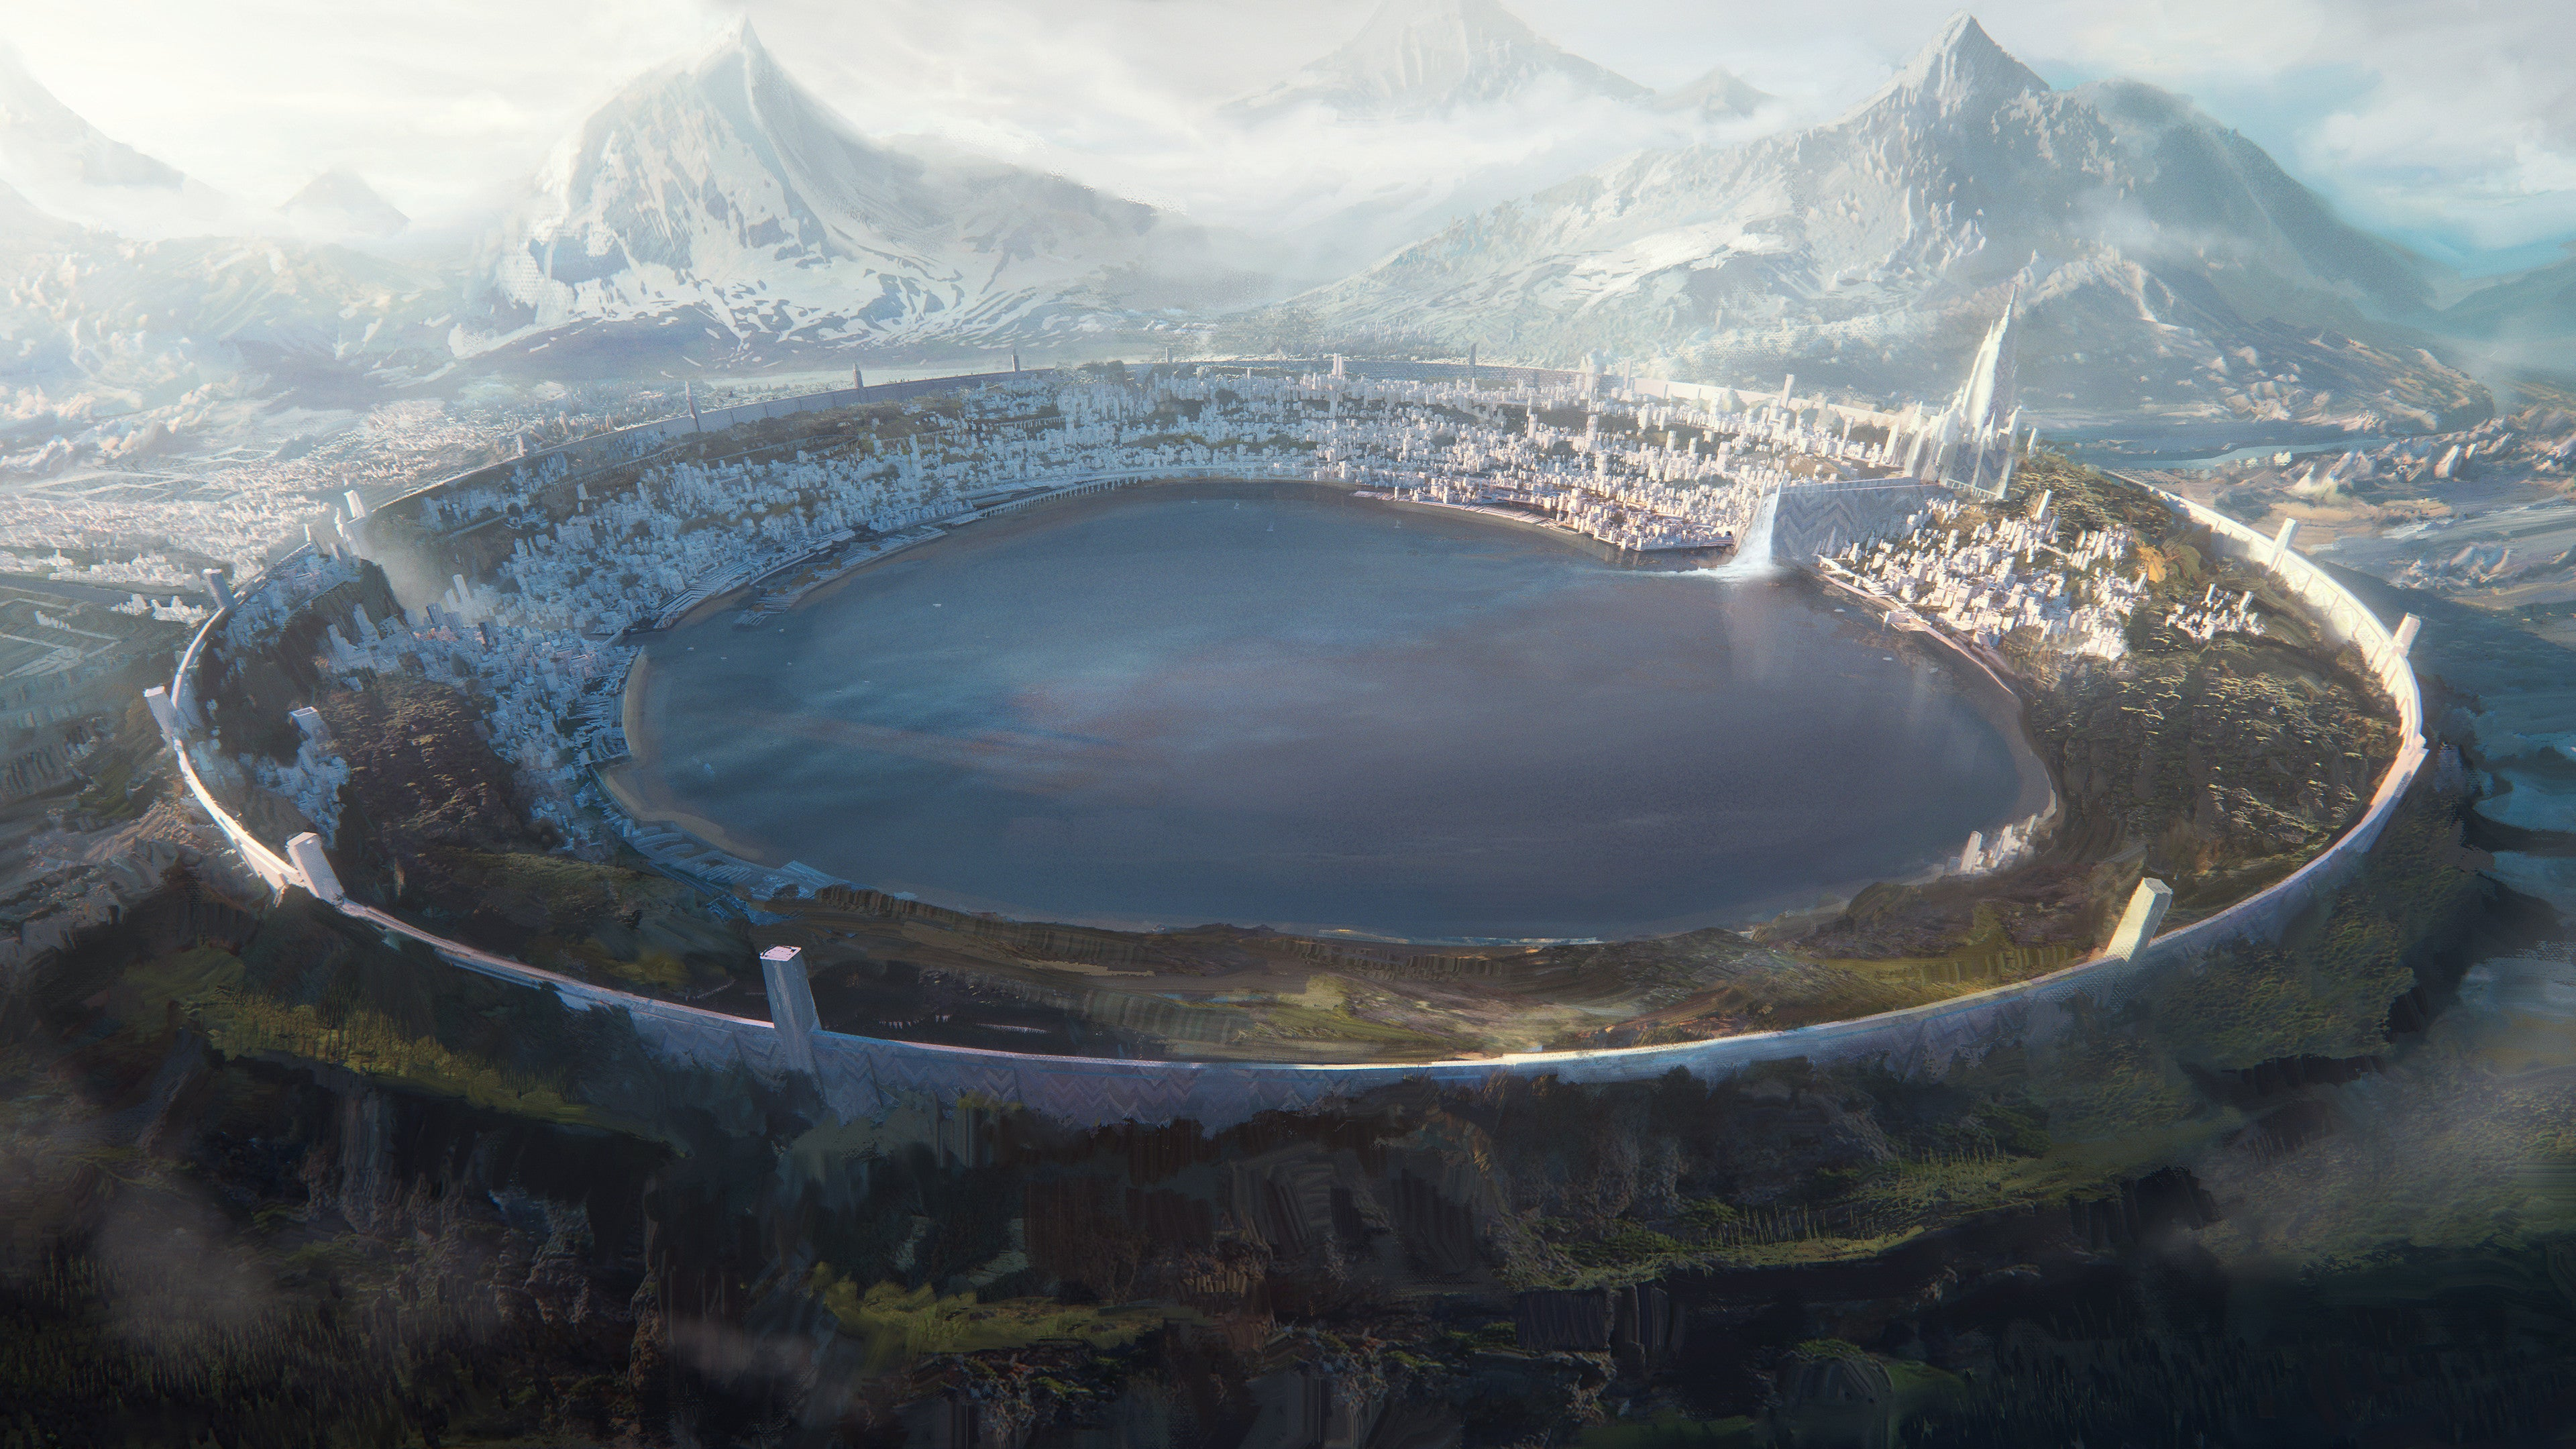 General 3840x2160 artwork digital art city fantasy architecture fantasy art mountains